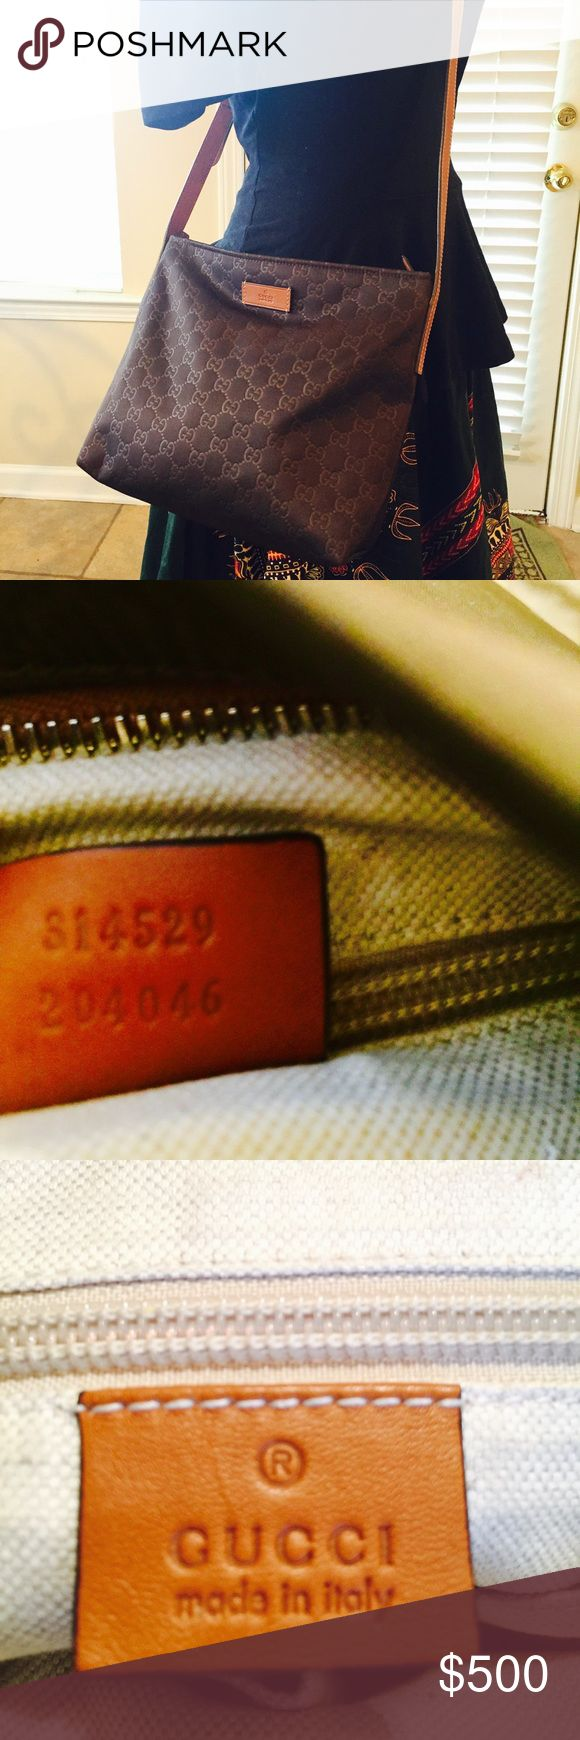 "AUTHENTIC Gucci Messenger Bag 100% Authentic Gucci Messenger Bag ""Excellent"" condition dark Brown Gucci Bags Shoulder Bags"